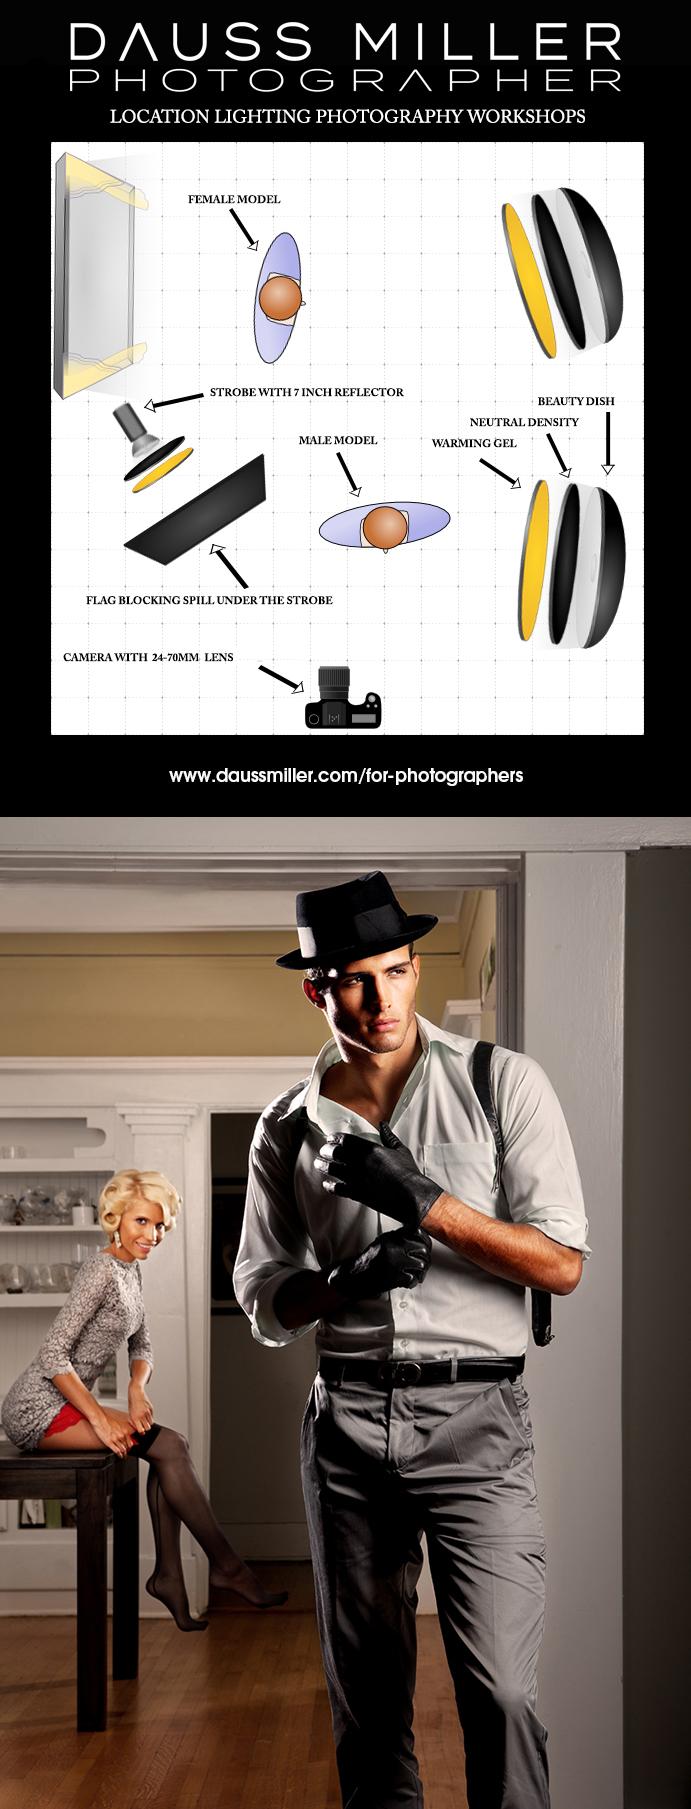 IMAGE + Lighting-Diagrams-G-1.2-final.jpeg